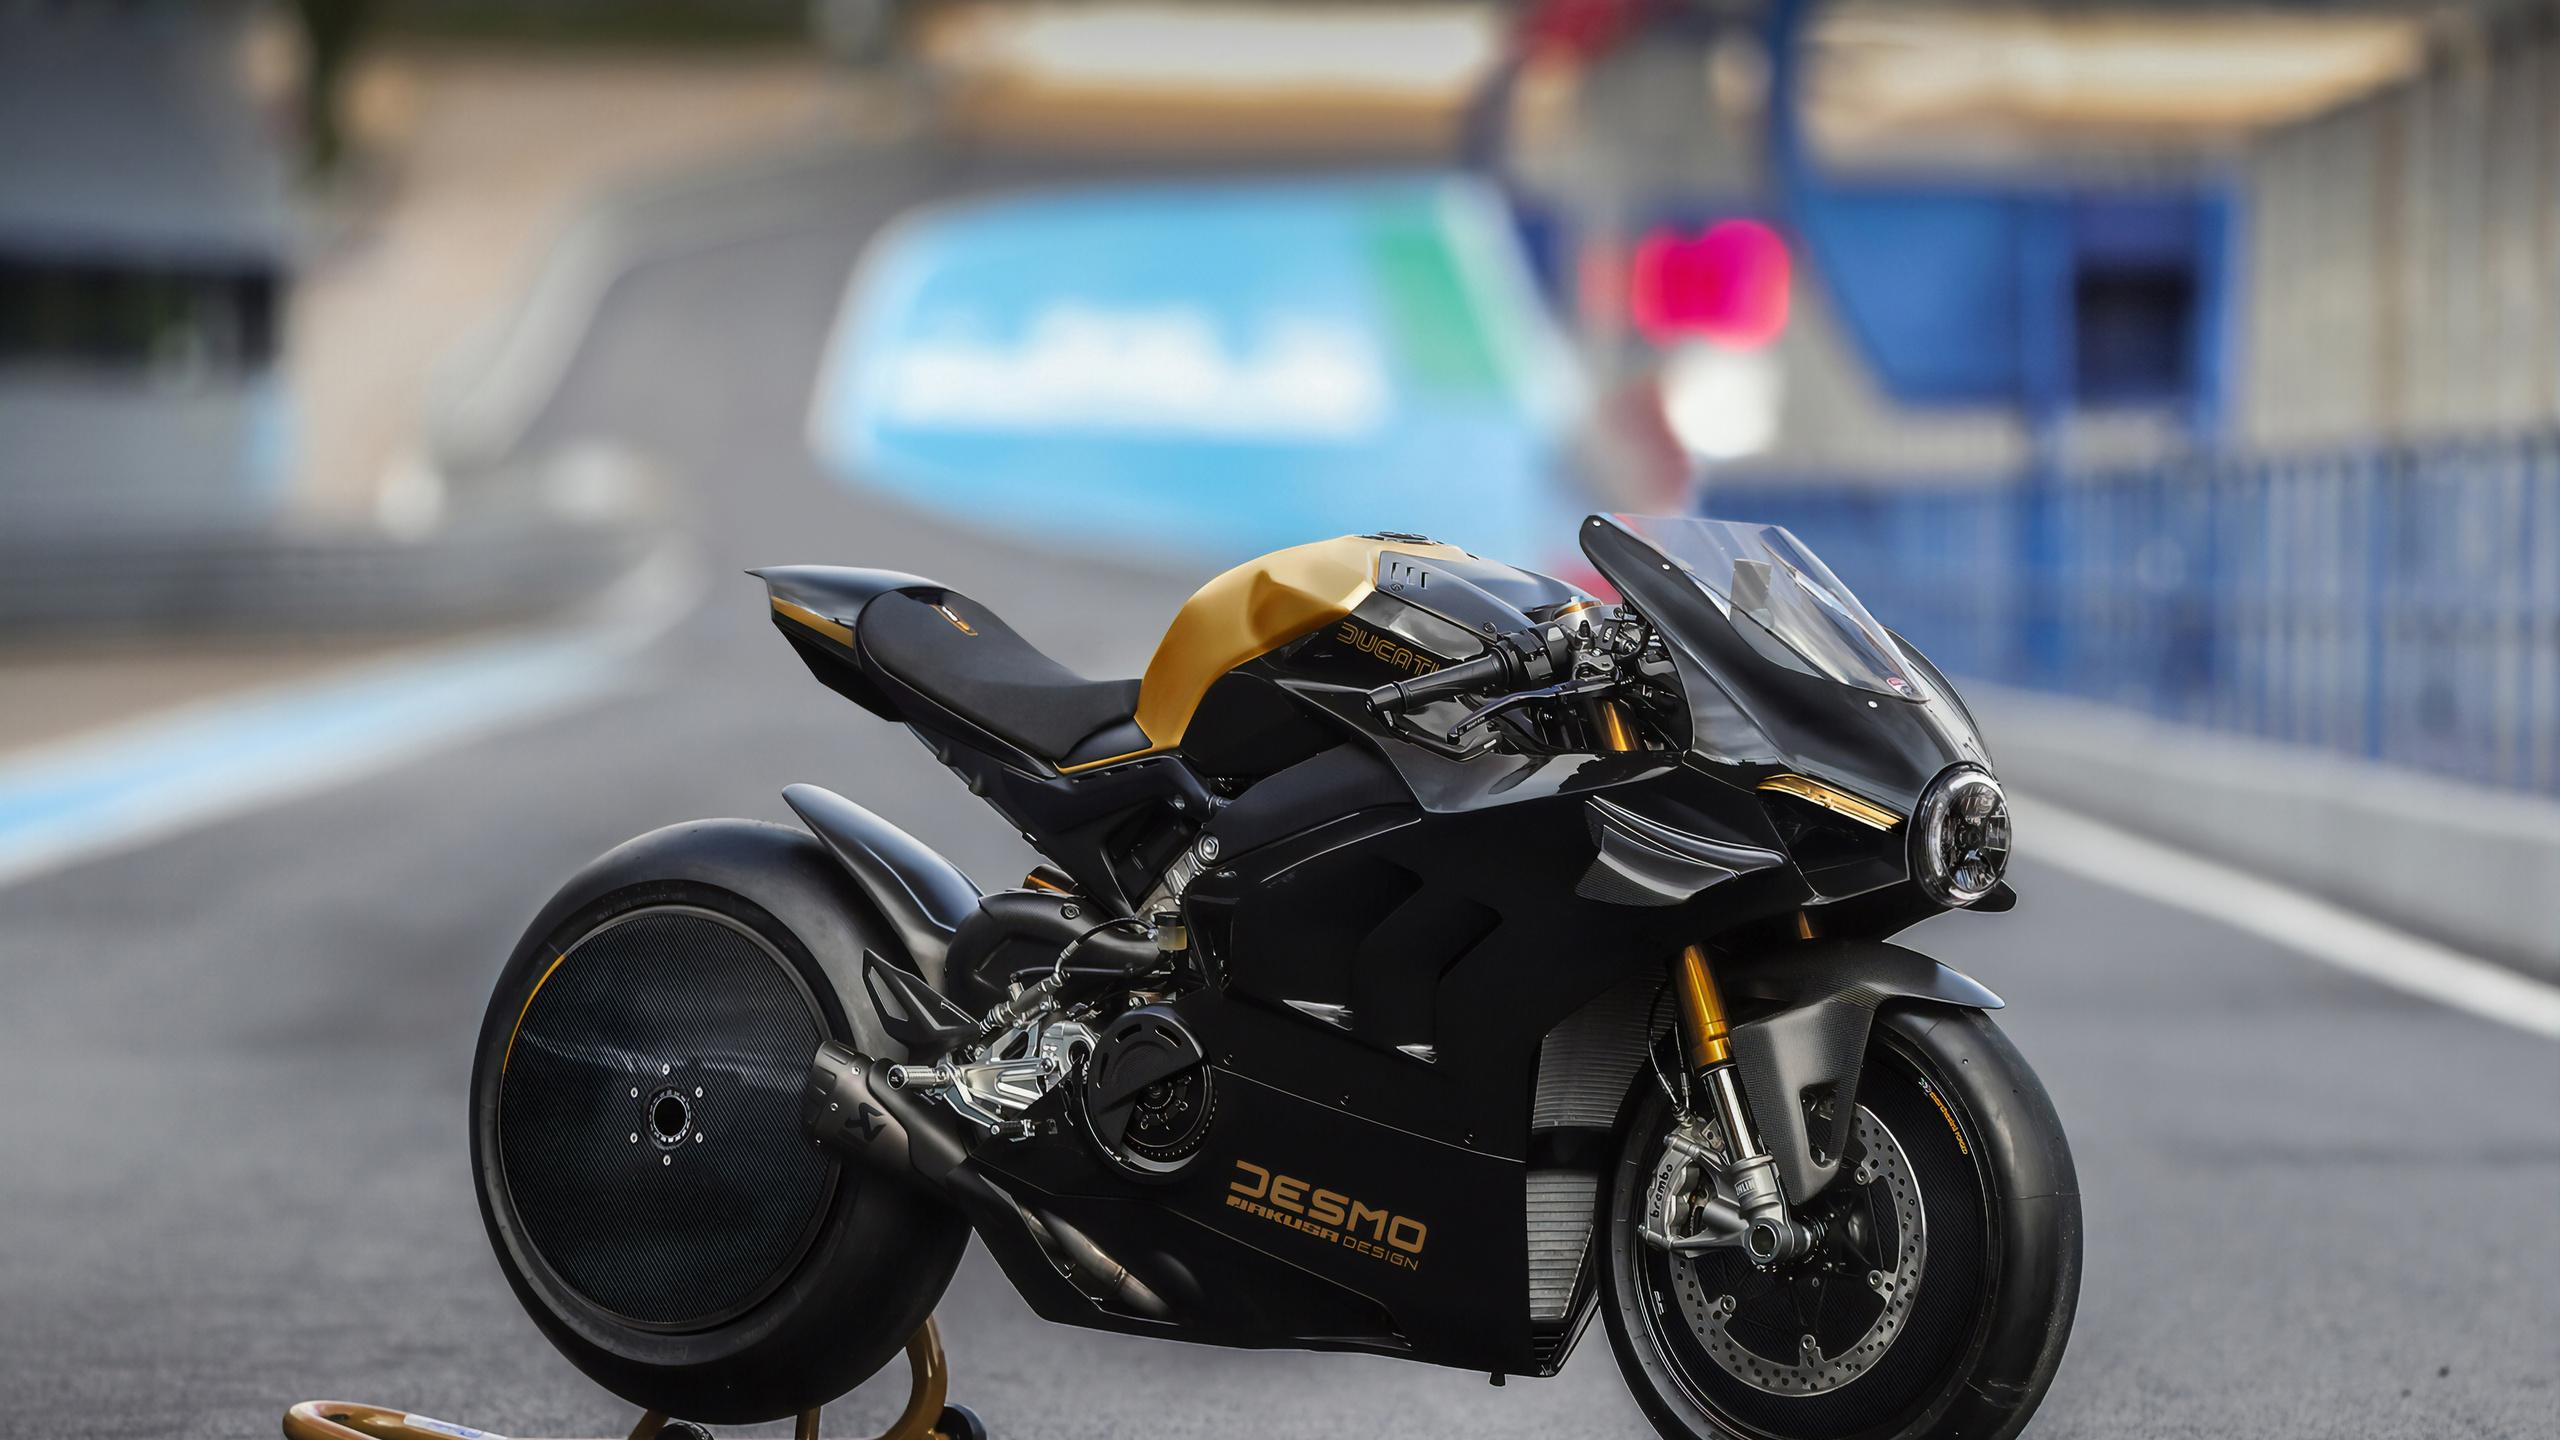 ducati, concept, байк, мотоцикл